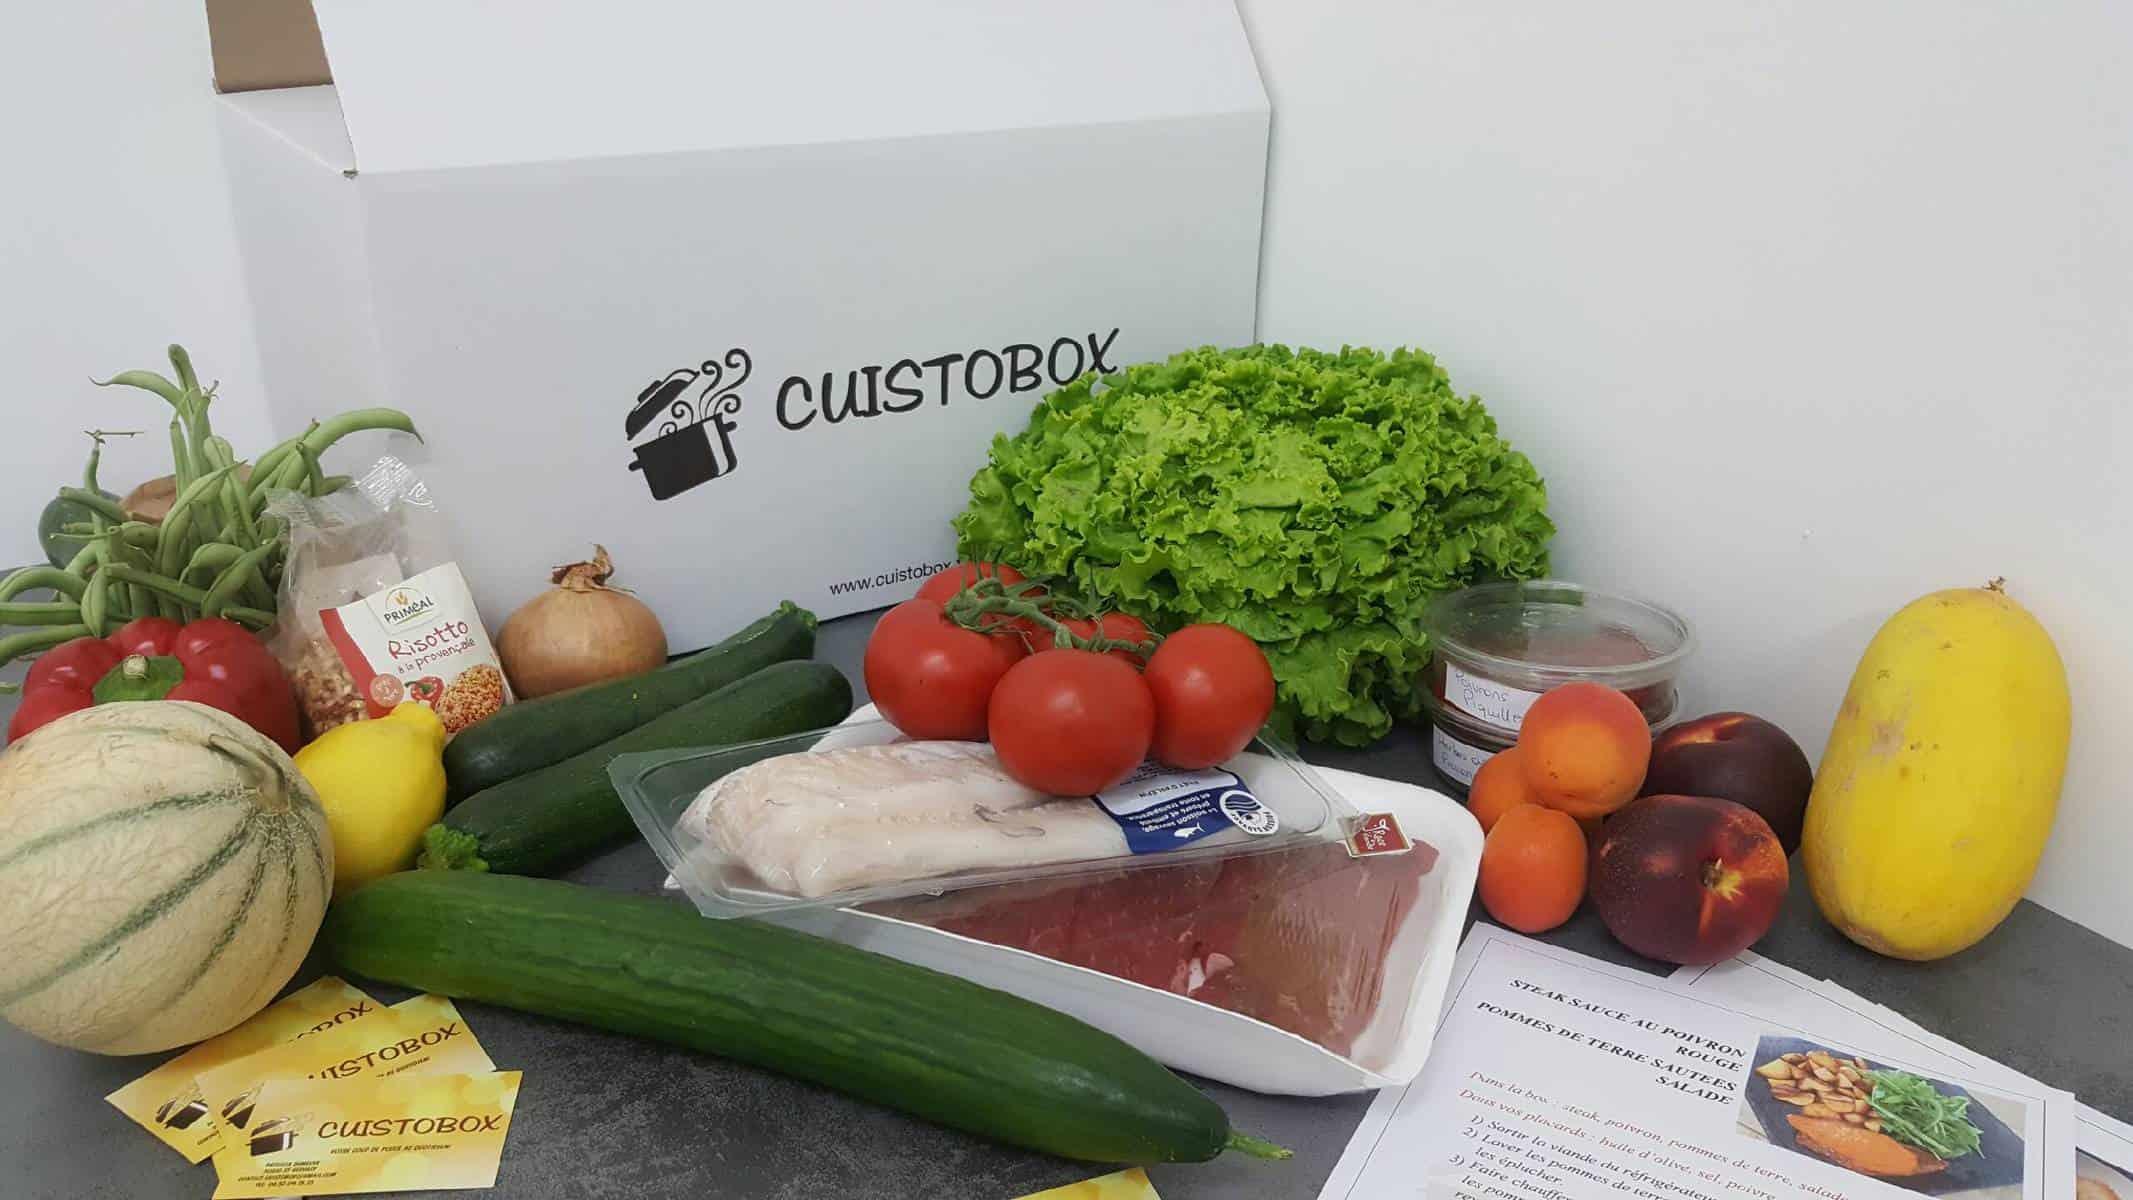 Cuistobox